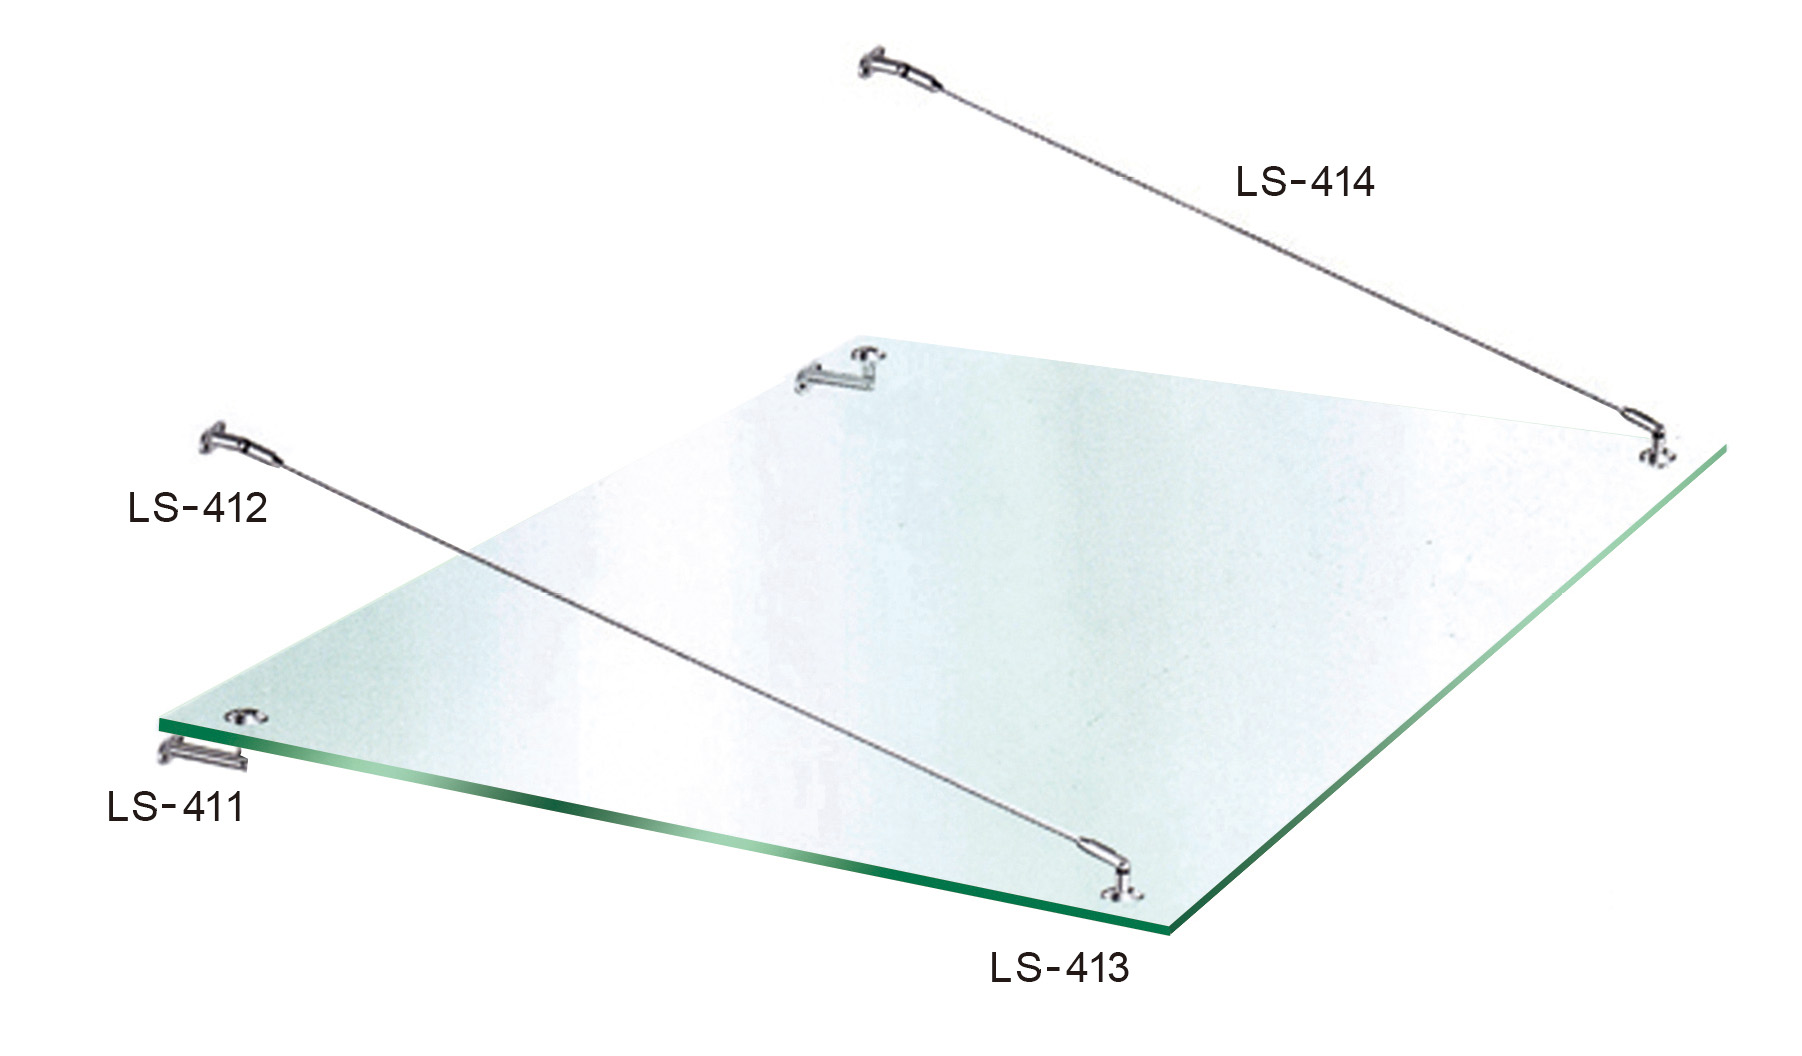 LS-411-412-413-414